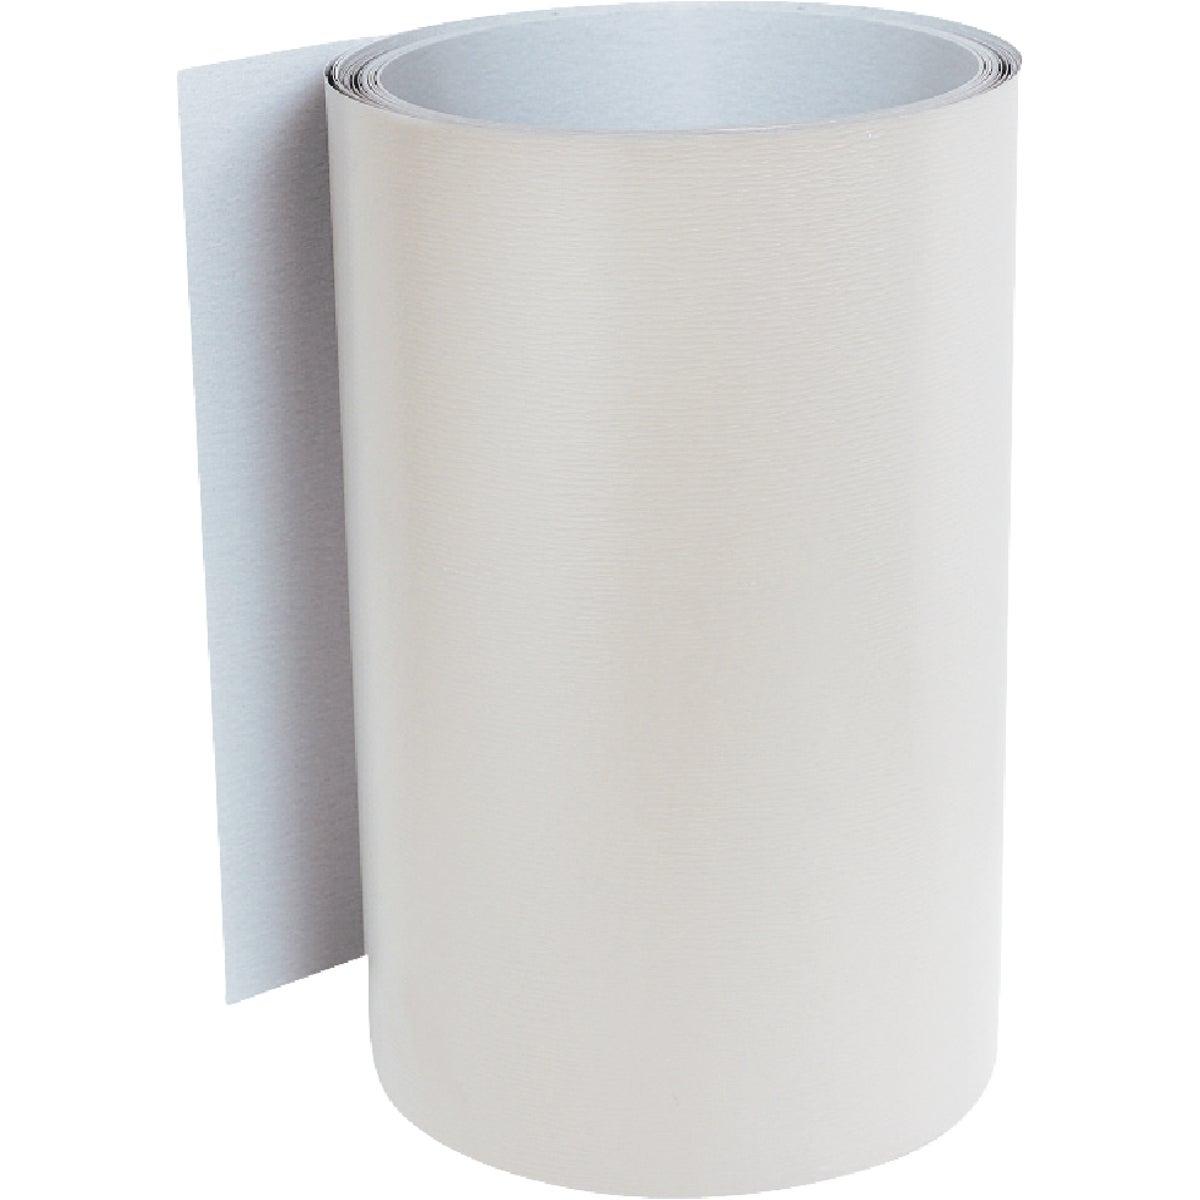 12X50 WHITE TRIM COIL - 30180-AJ21 by Klauer Mfg Co